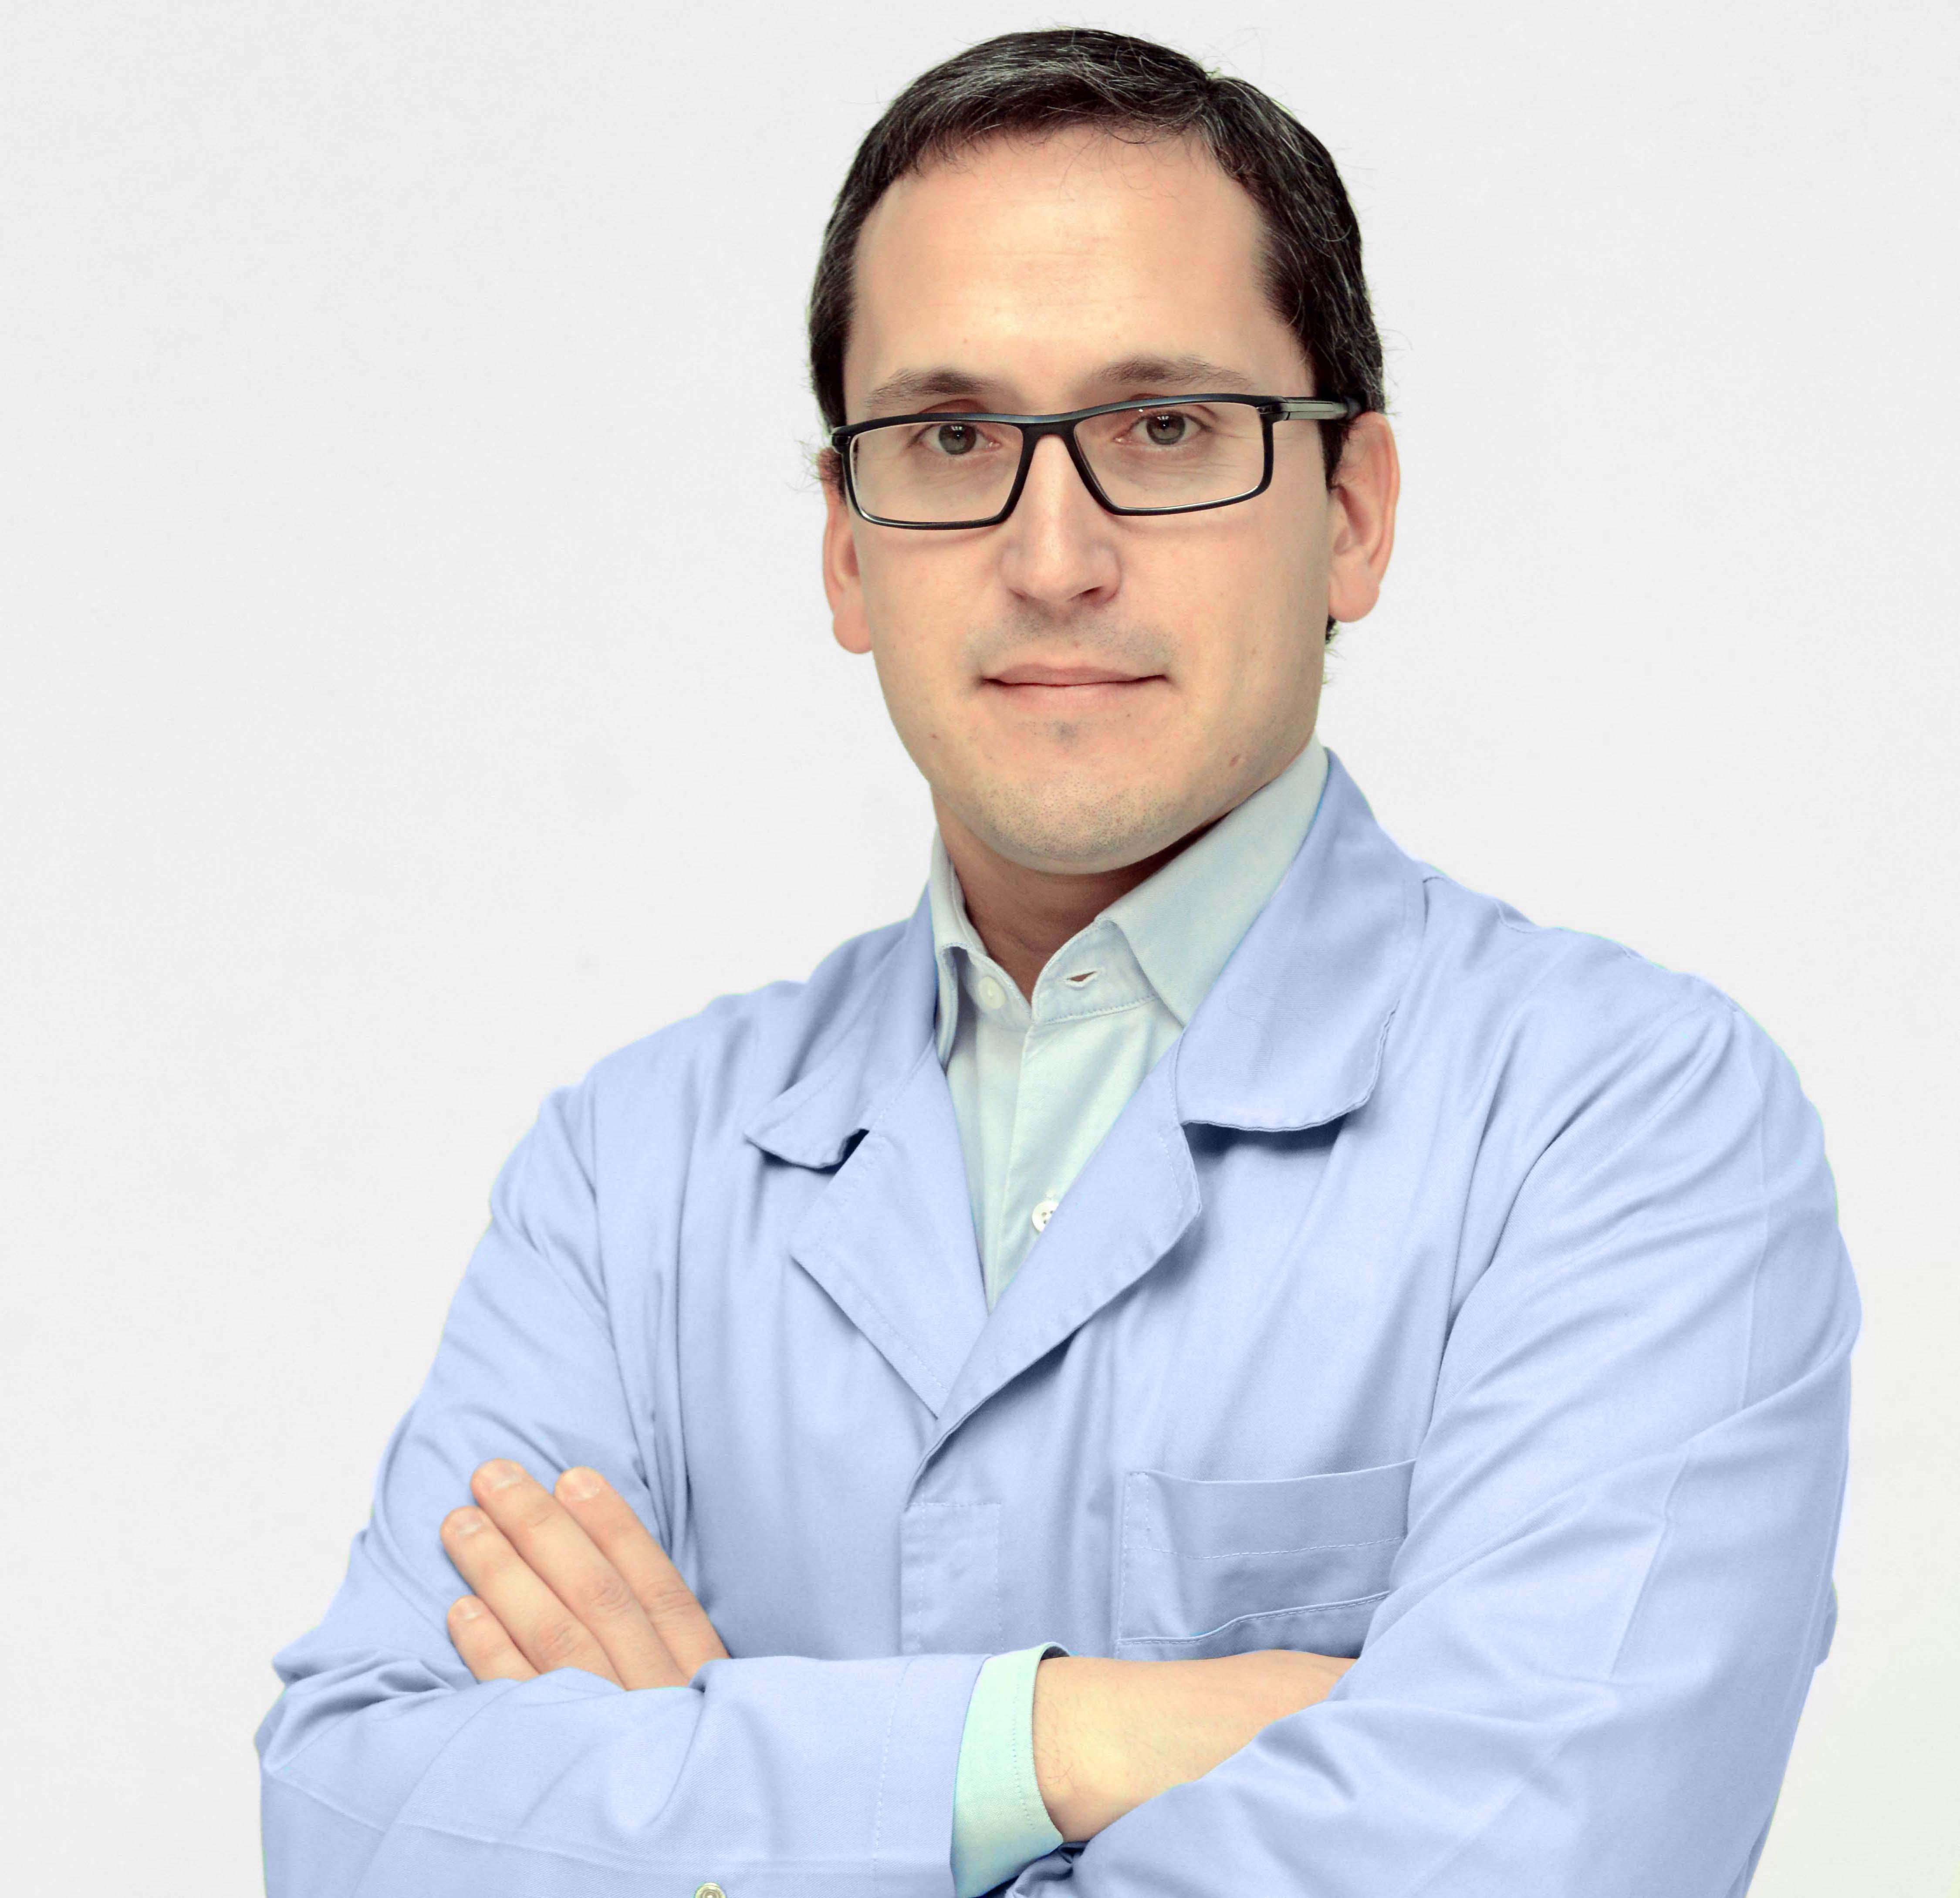 NUNO SEVIVAS MD PhD